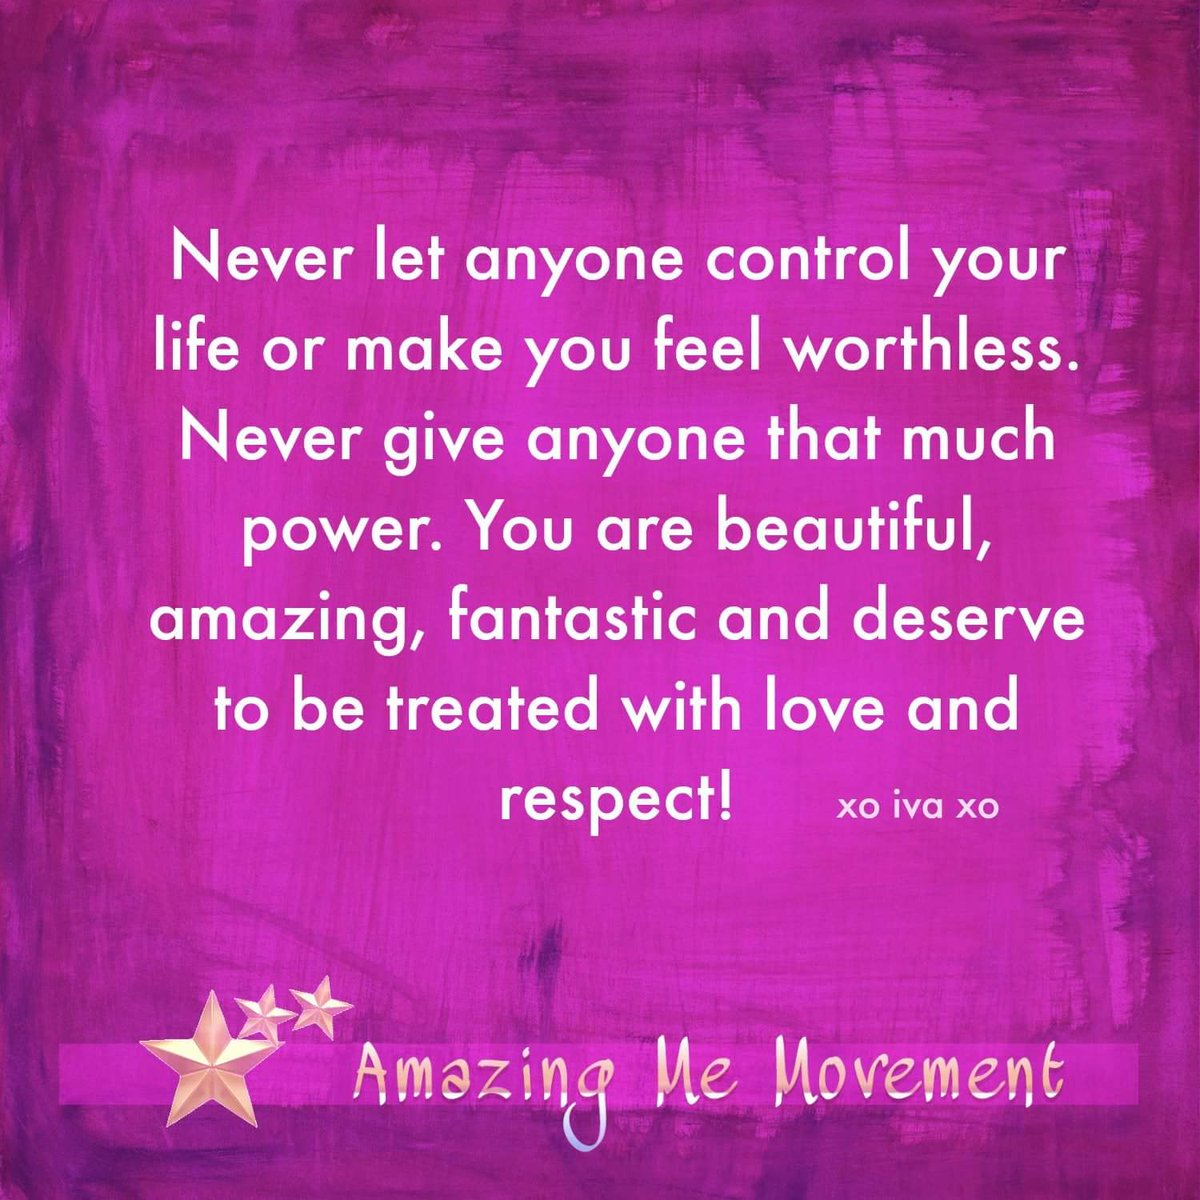 Never let anyone control your life... #BrightLights #brightfuture #MOTIVATIONMONDAY #Motivation #MotivationalQuotes #mondaymotivation<br>http://pic.twitter.com/mFVGgD5F9e